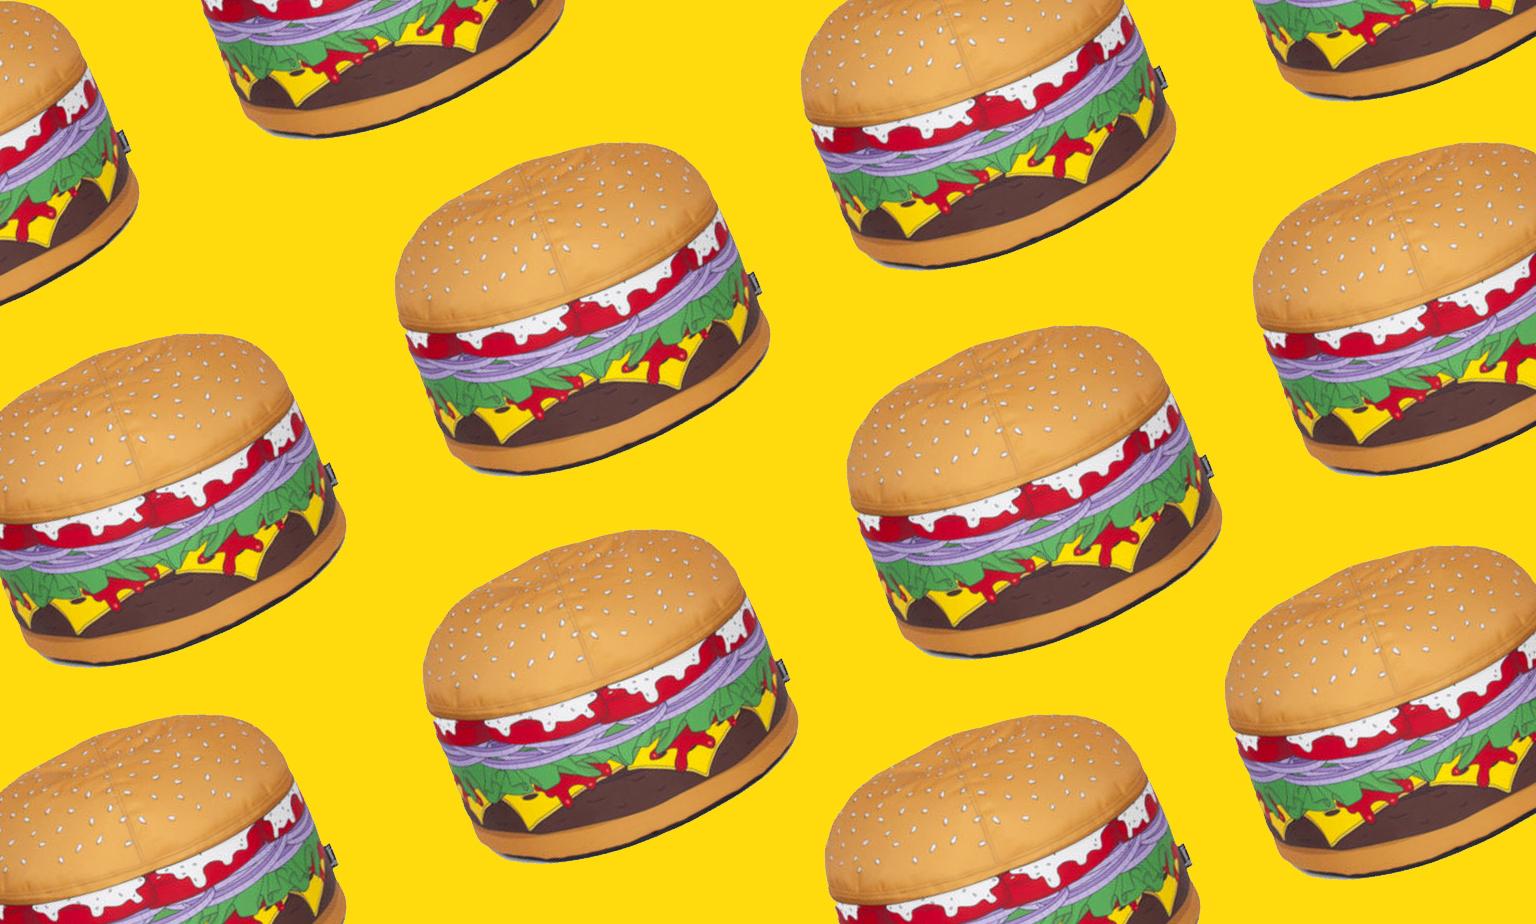 Bangin Burgers